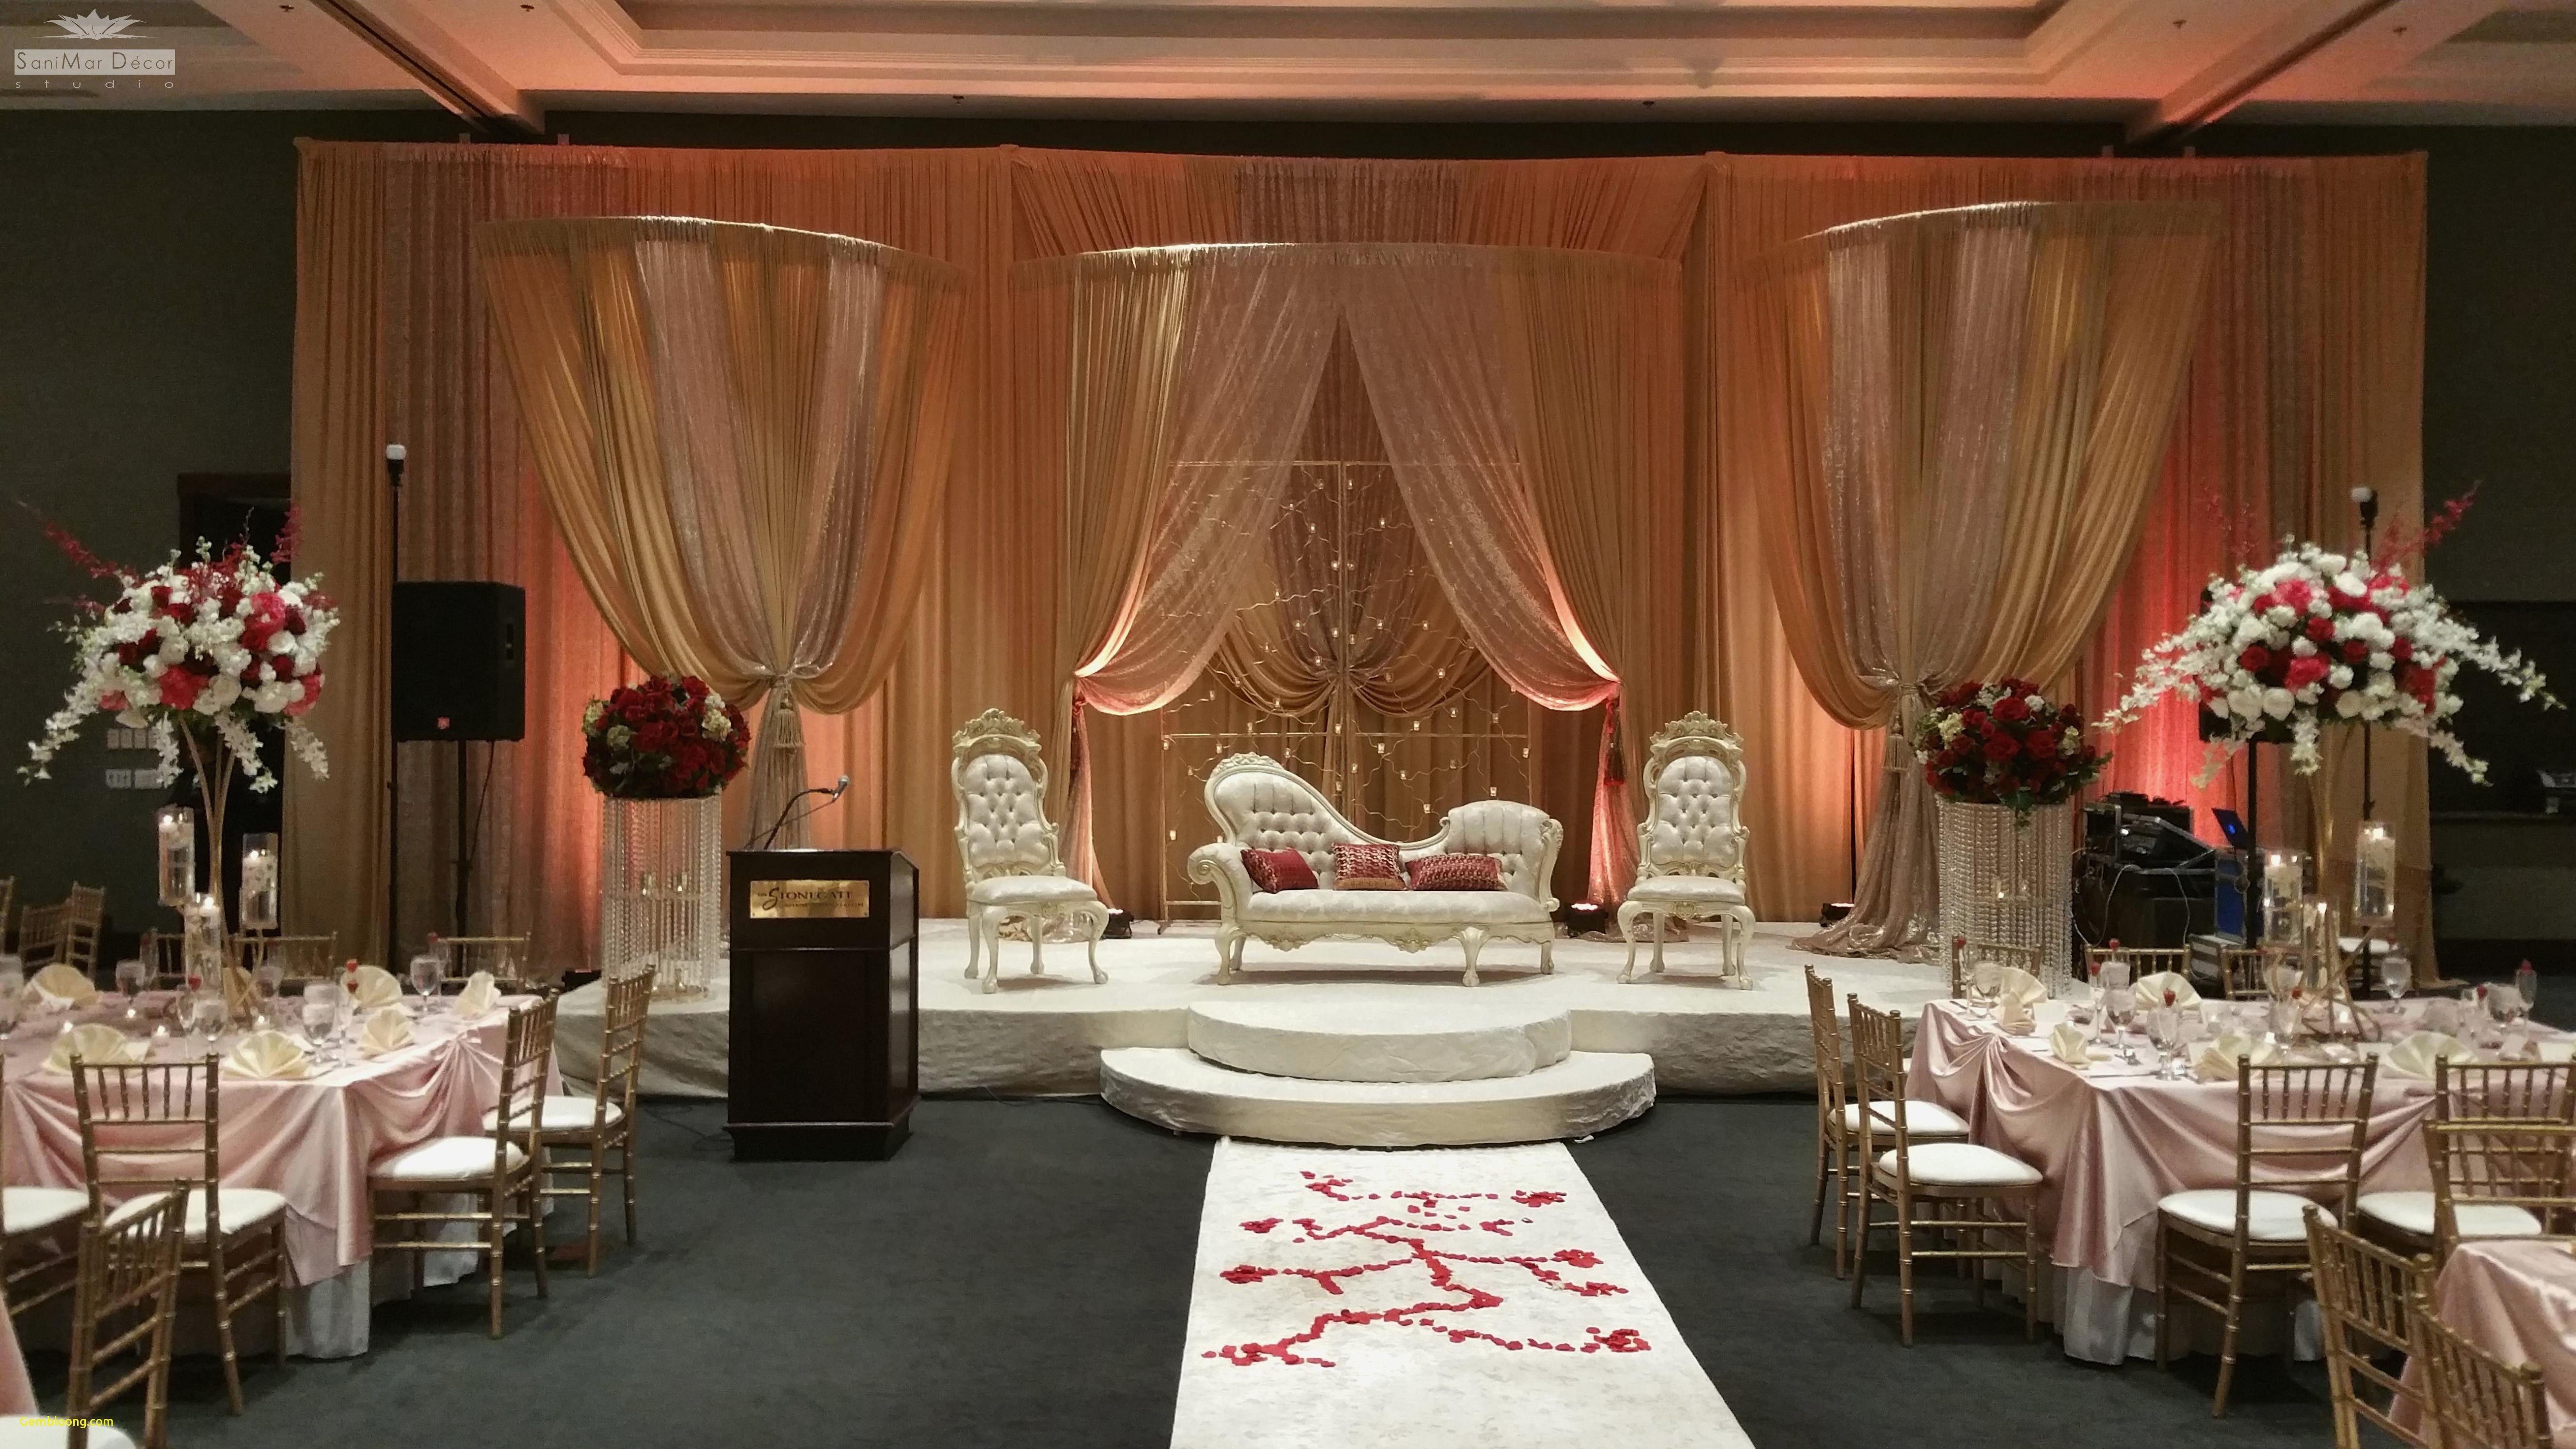 Hindu wedding decoration ideas  Fall Wedding Decoration u How to Capture the Colors Of the Season